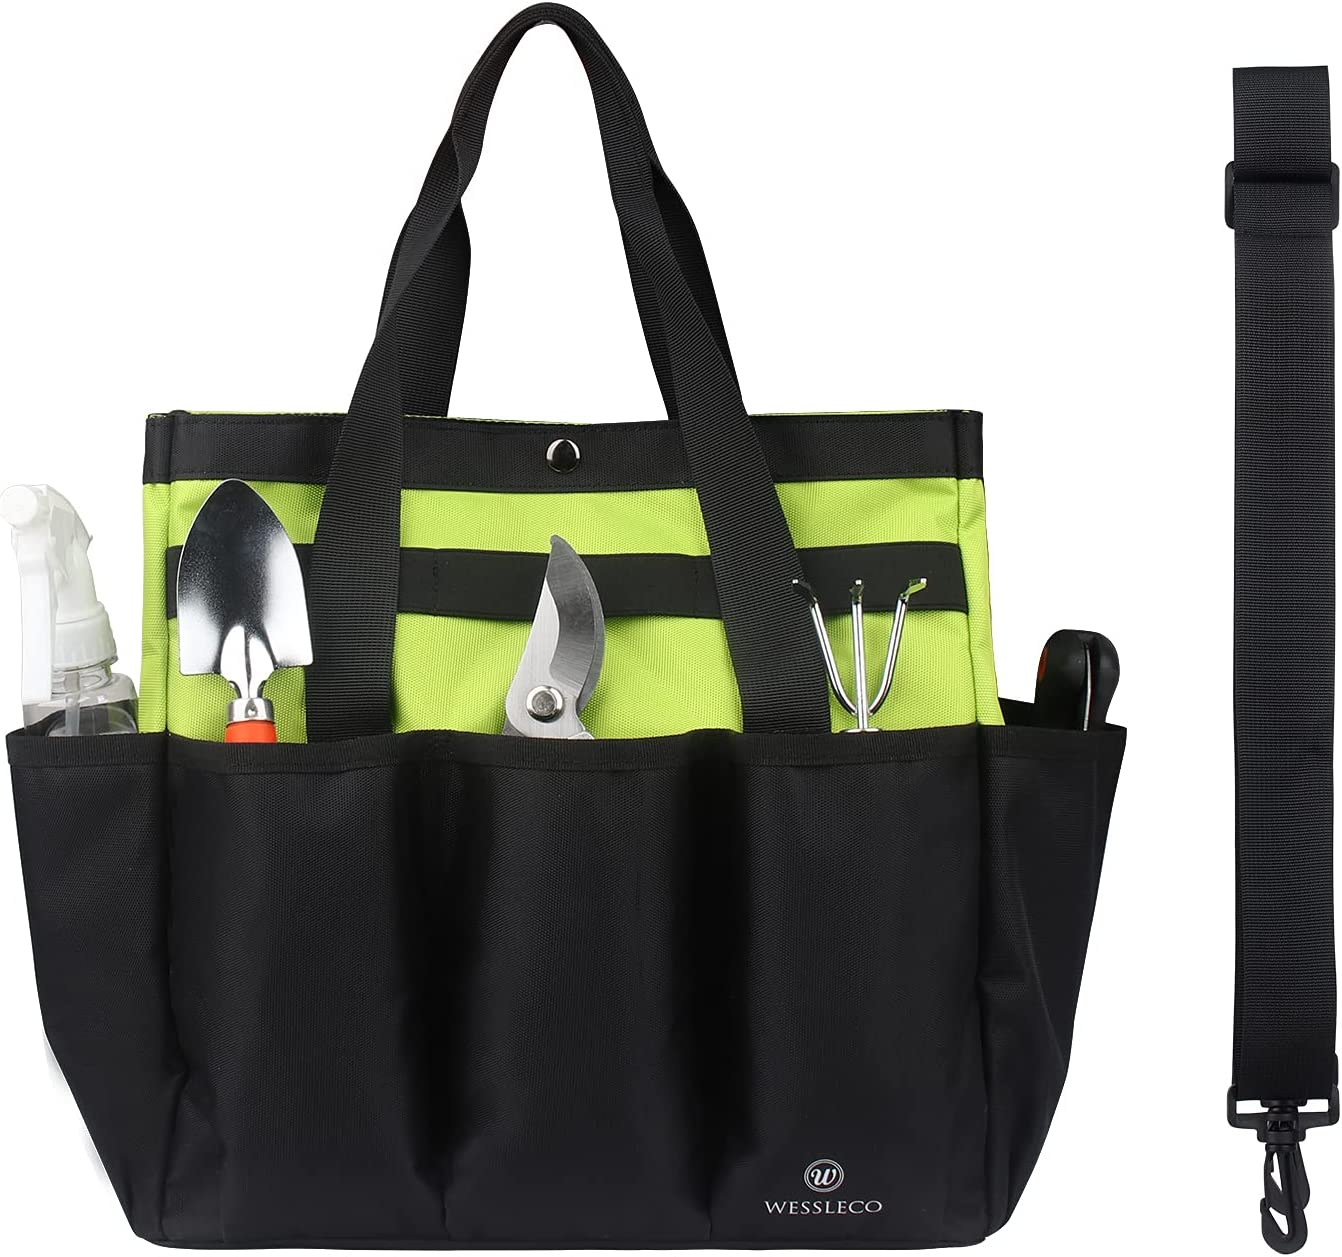 Wessleco Garden Tool Organizer,Gardening Tote Bag Storage for To